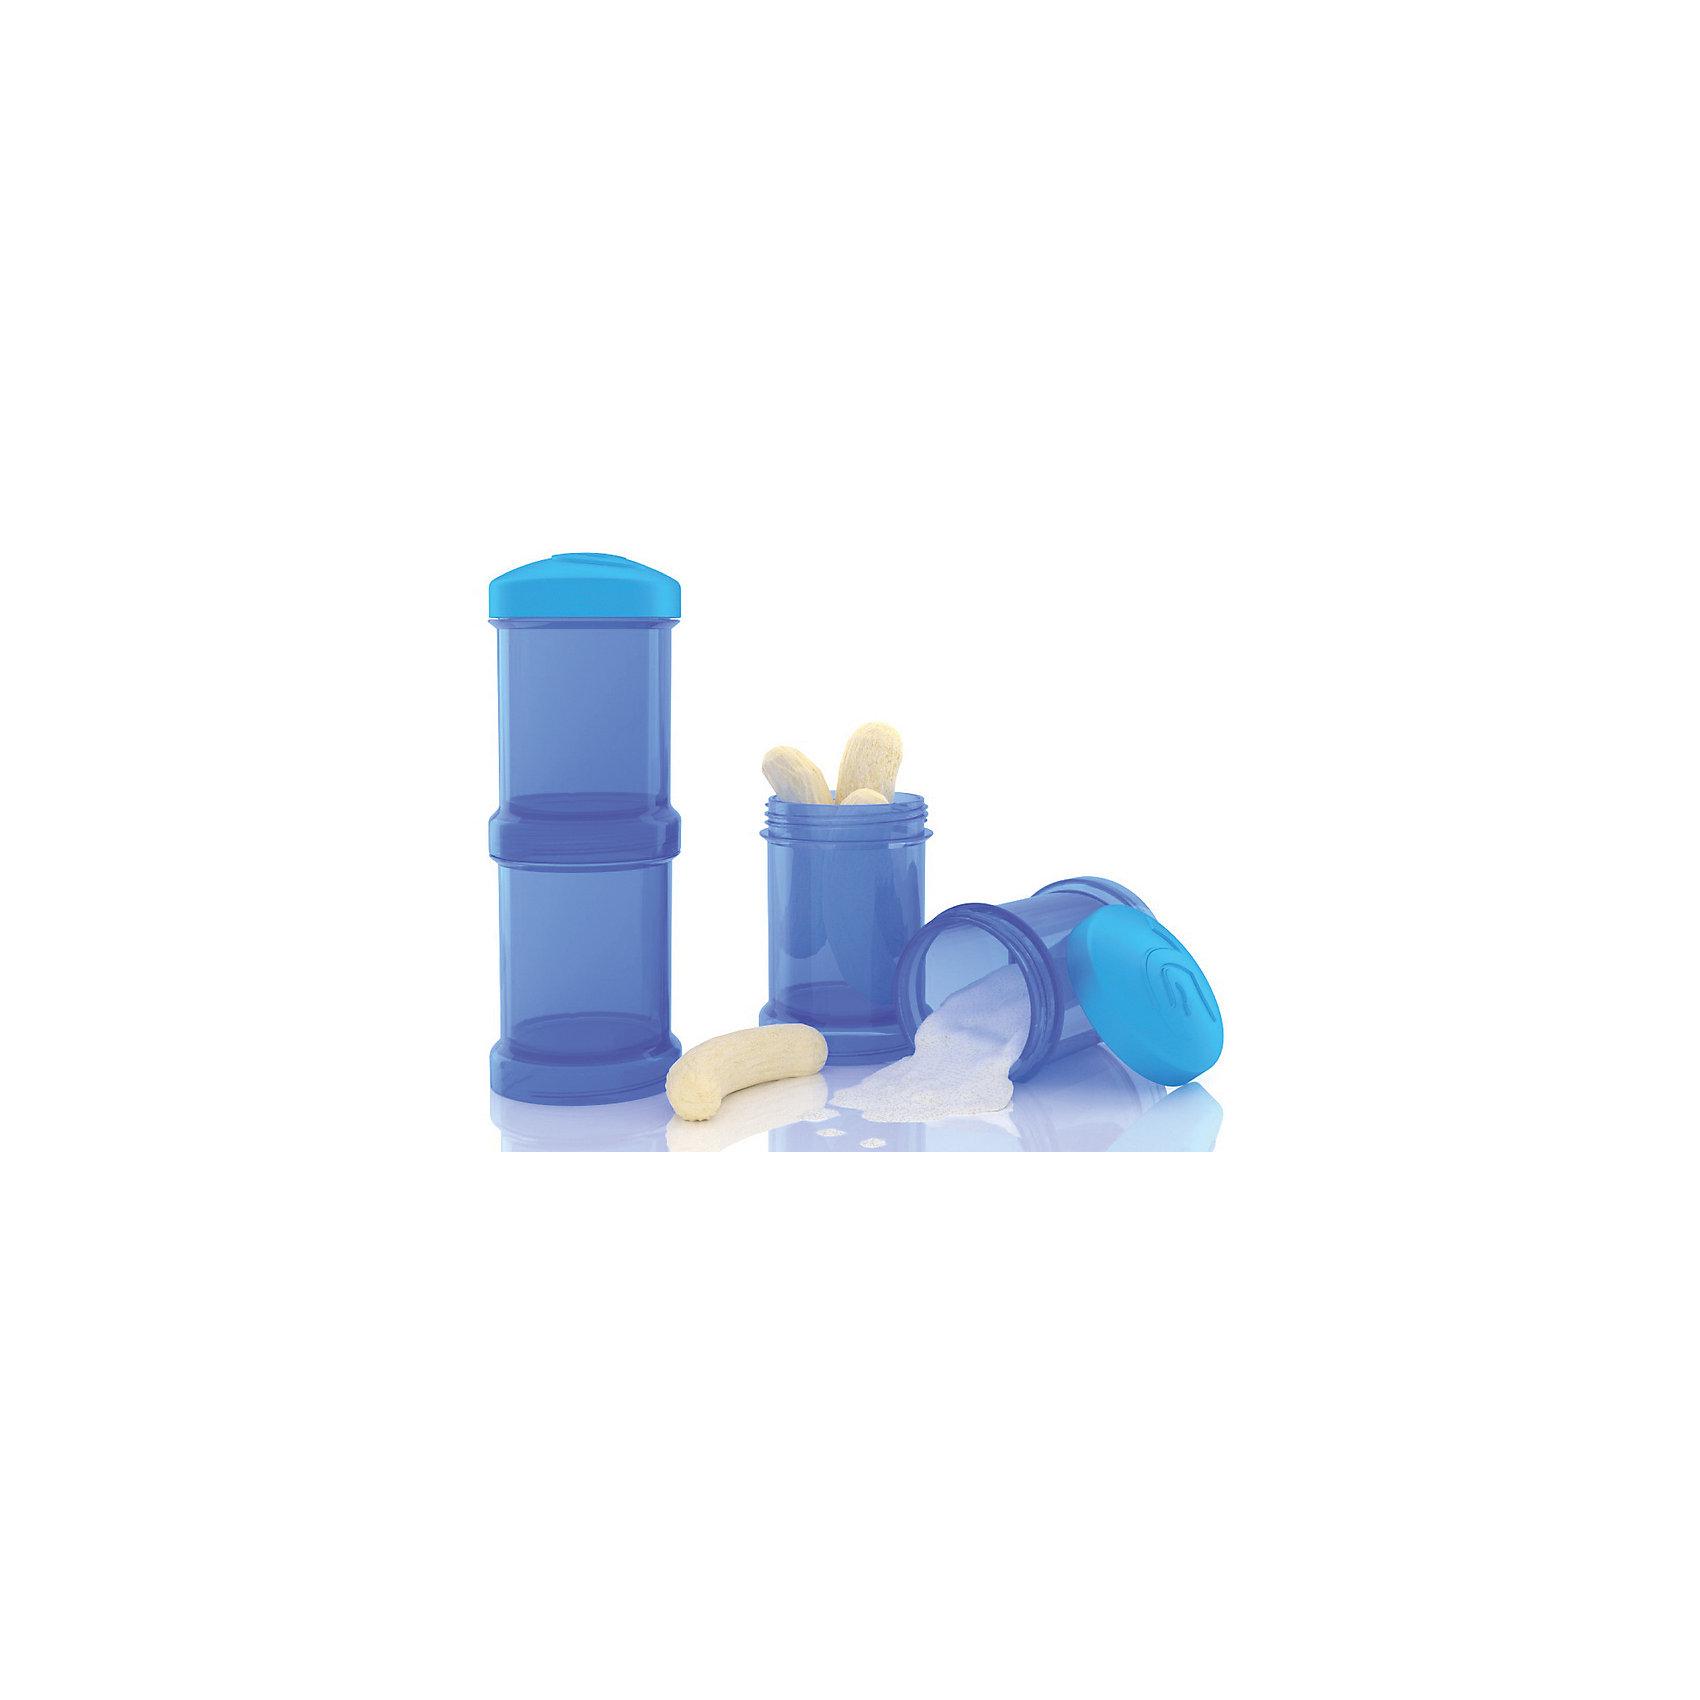 Twistshake Контейнер для сухой смеси 100 мл. 2 шт., TwistShake, синий молоток для отбивания мяса tefal ingenio цвет черный